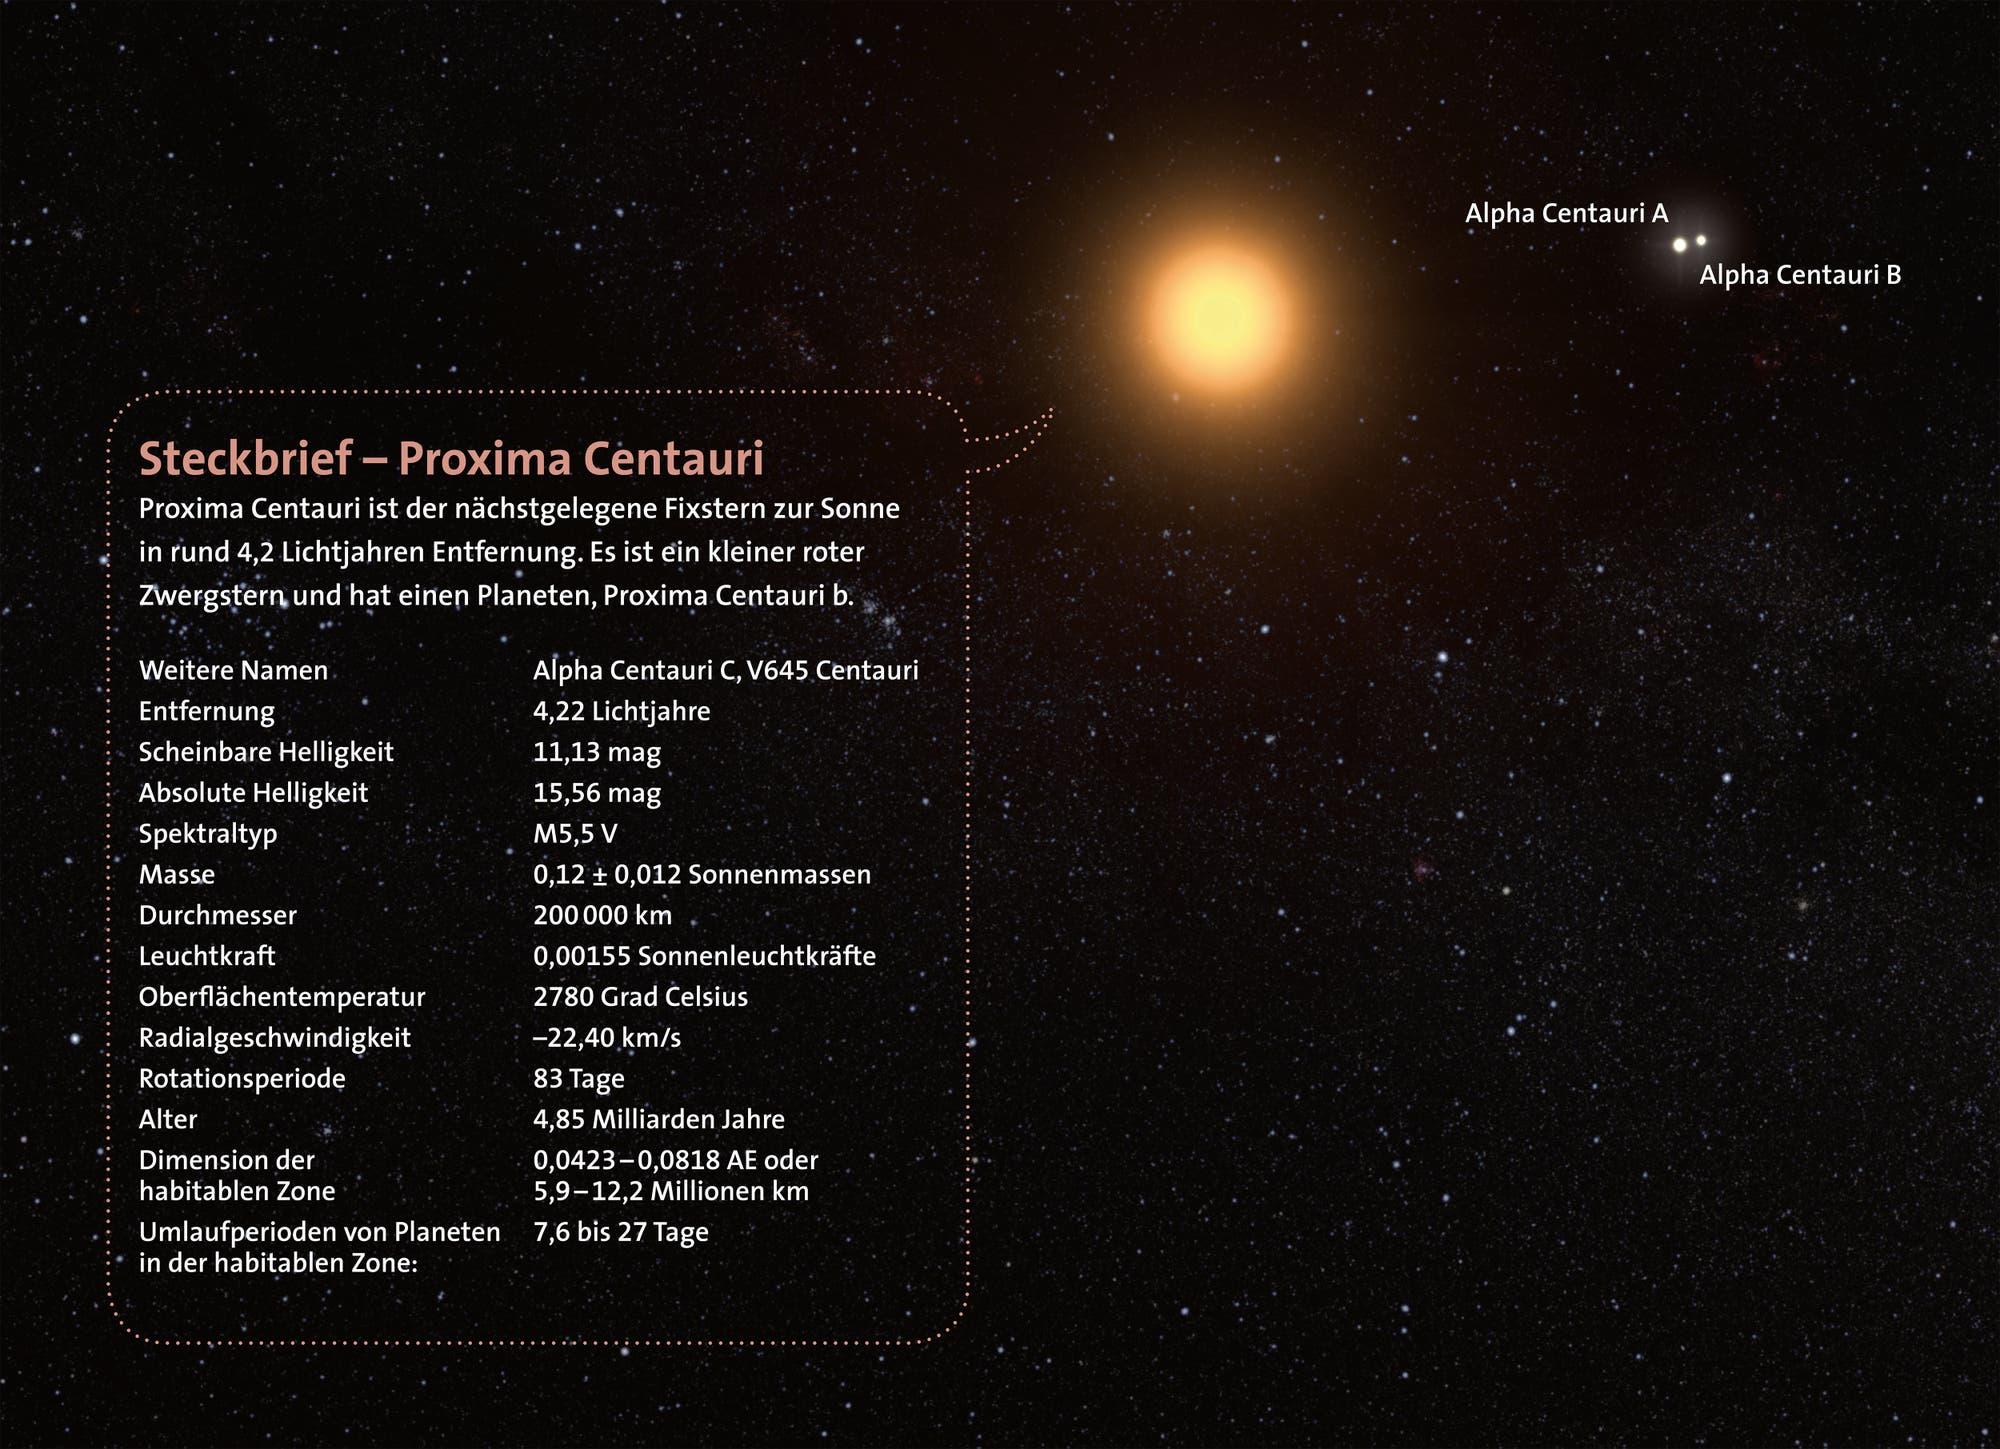 Steckbrief Proxima Centauri